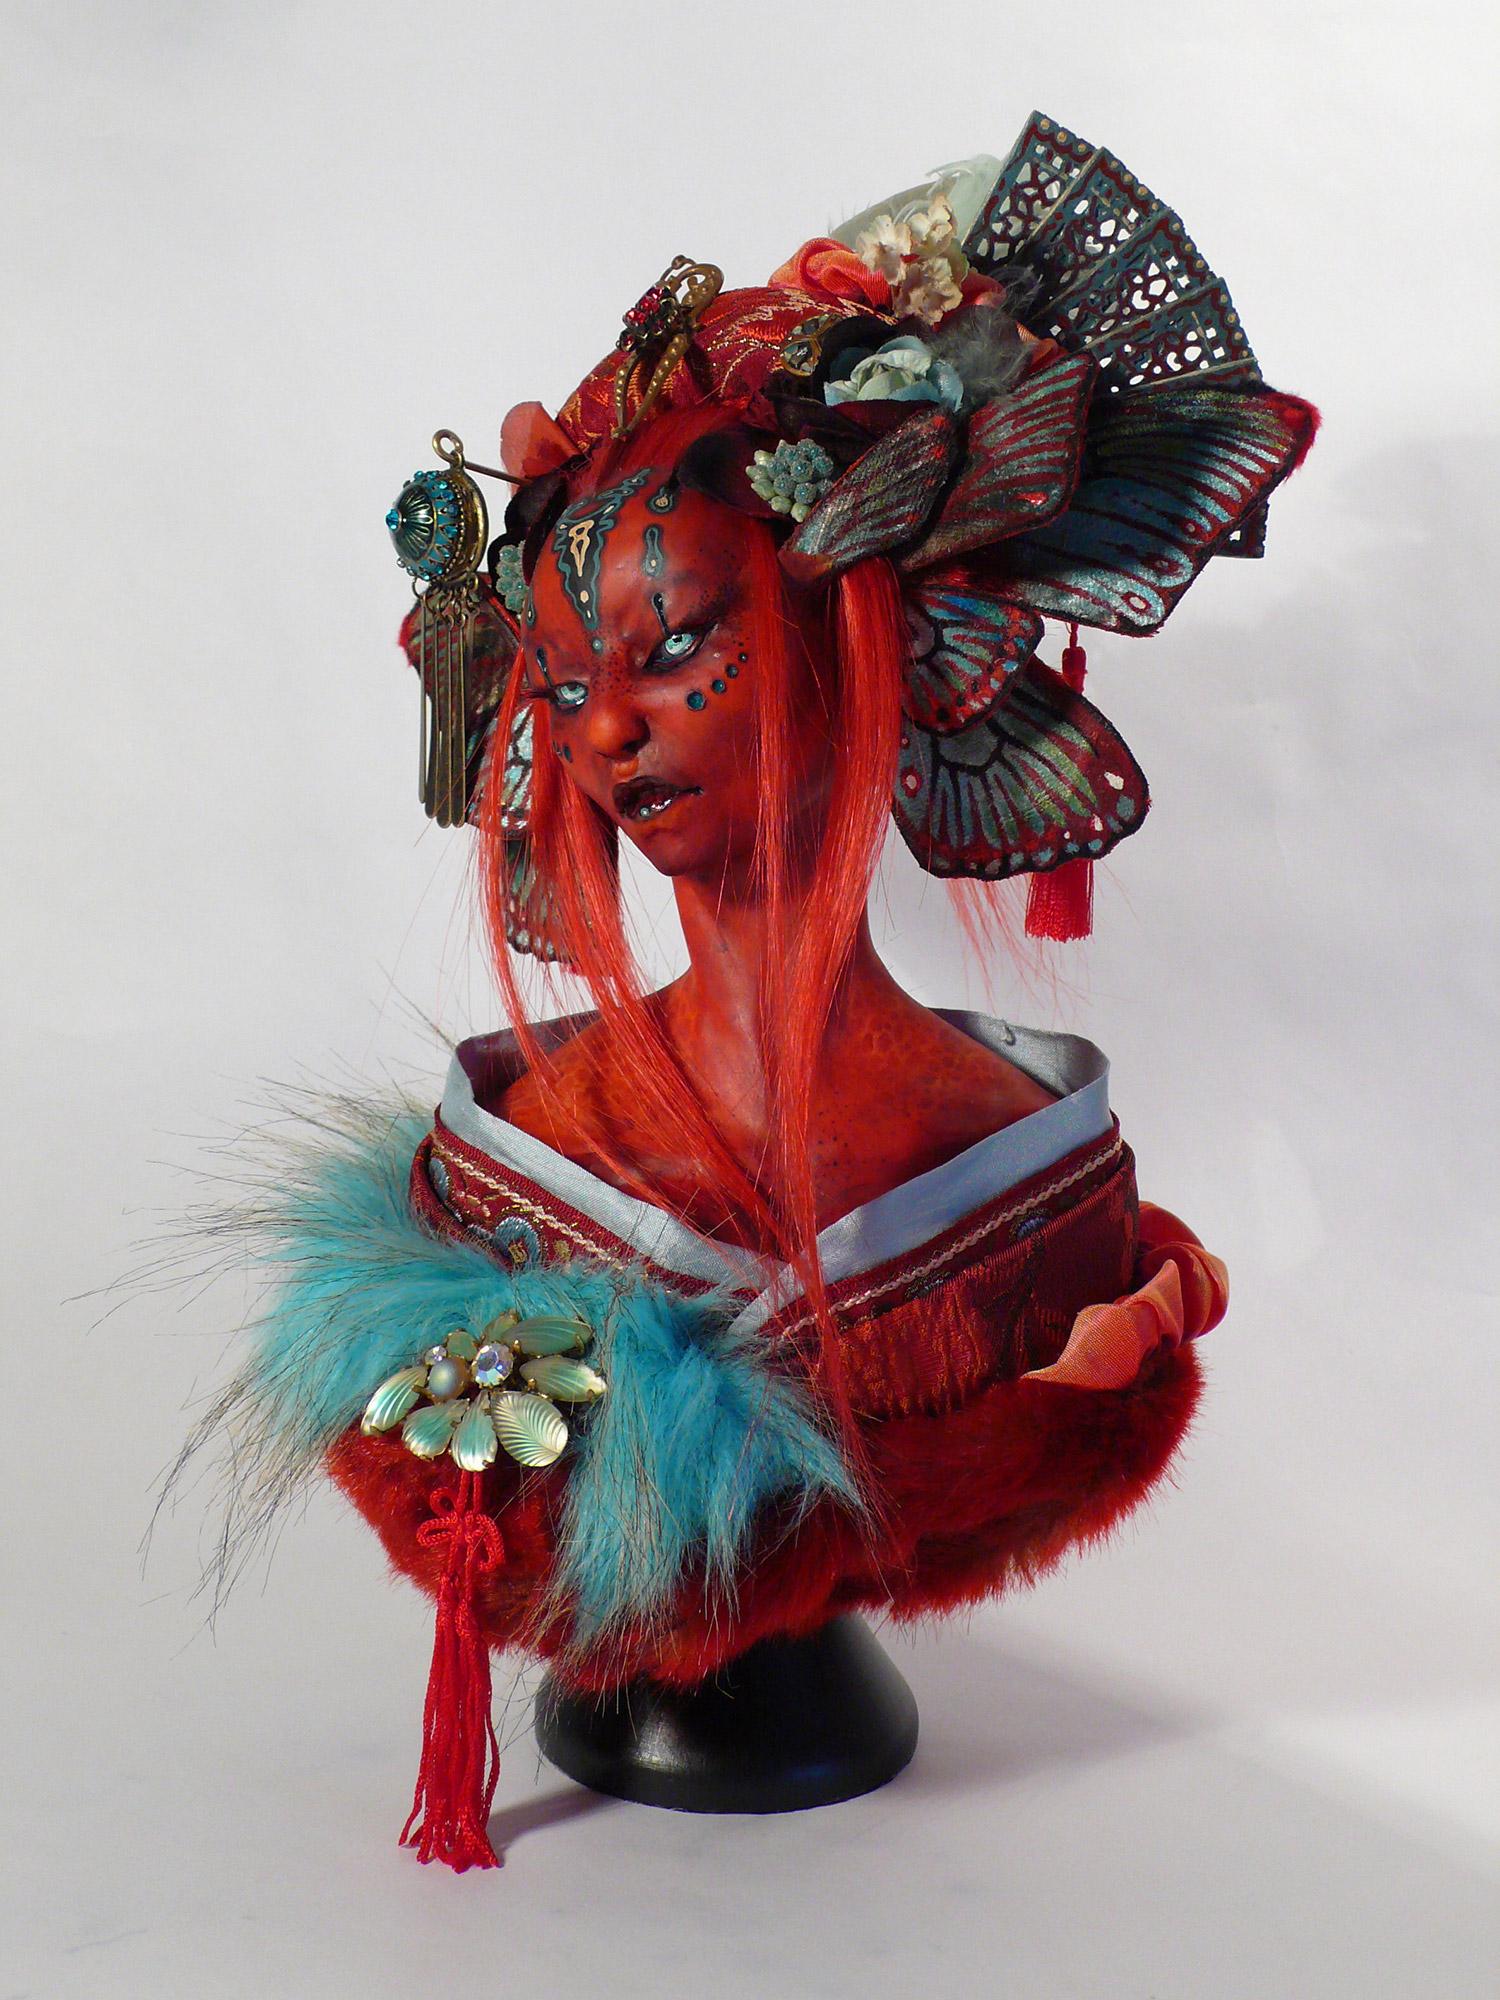 Virginie Ropars - Bombyx Mori doll sculpture